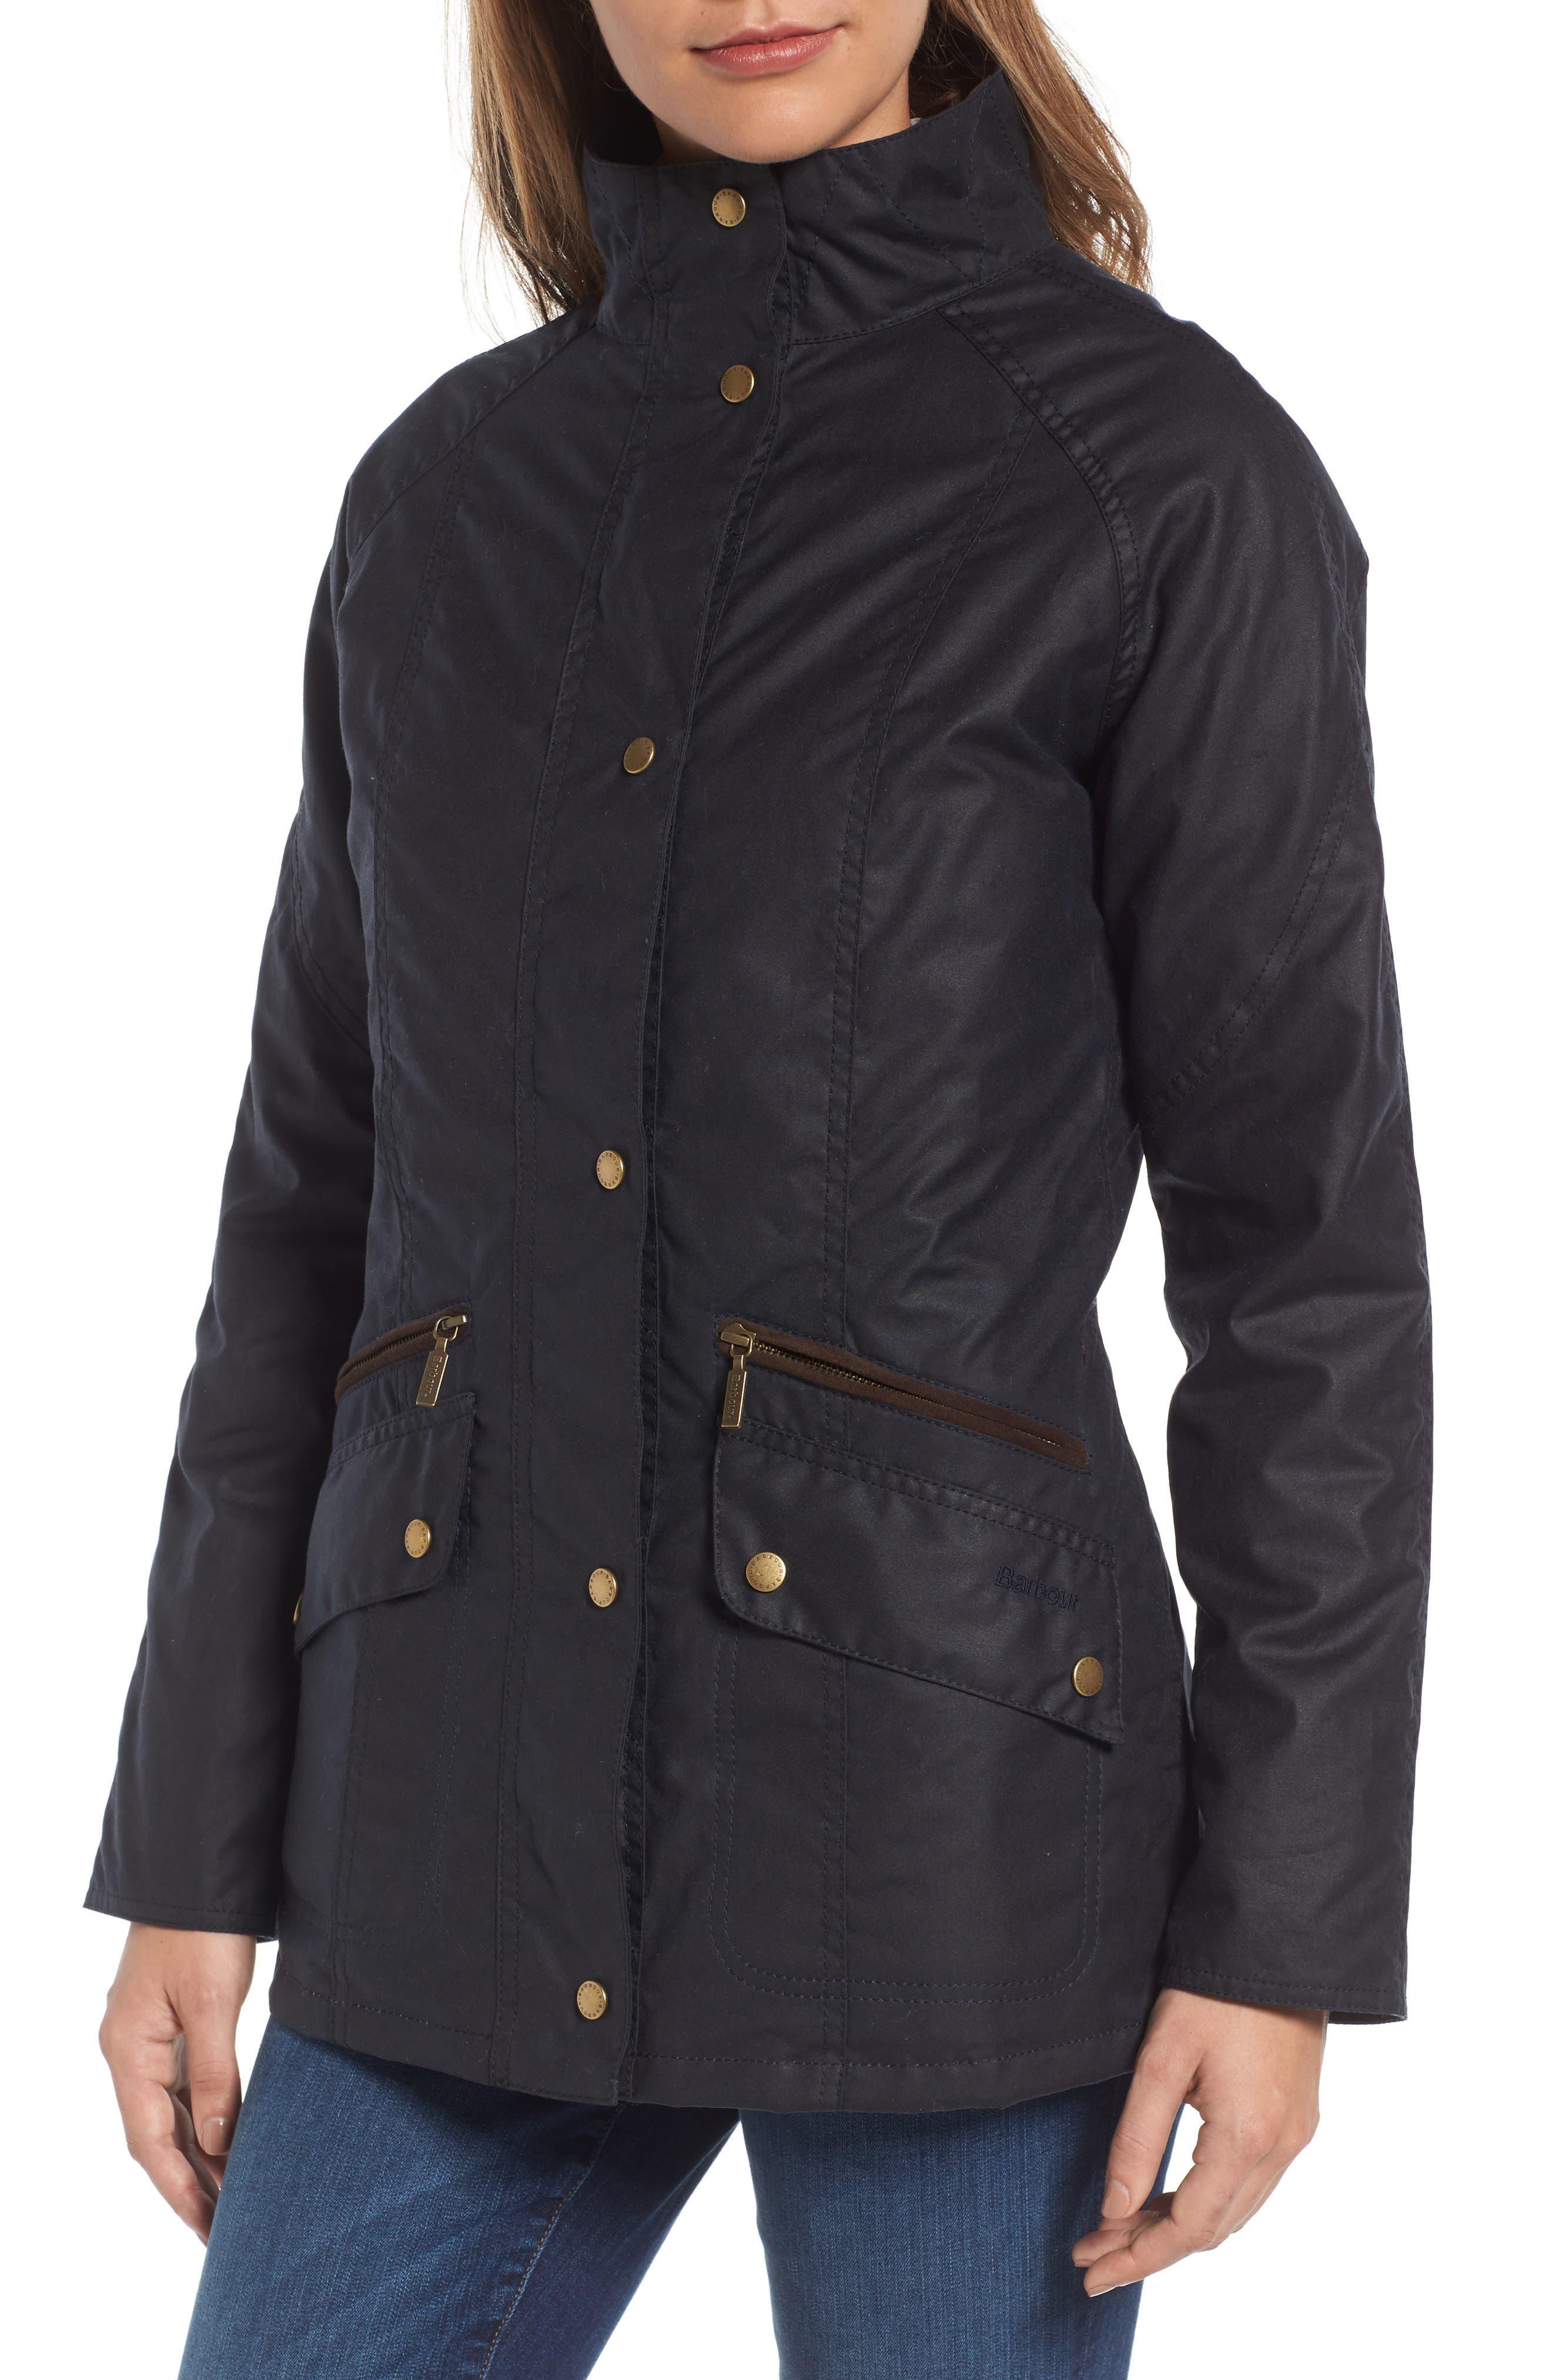 Barrowdale Waxed Cotton Coat,                             Alternate thumbnail 5, color,                             Navy